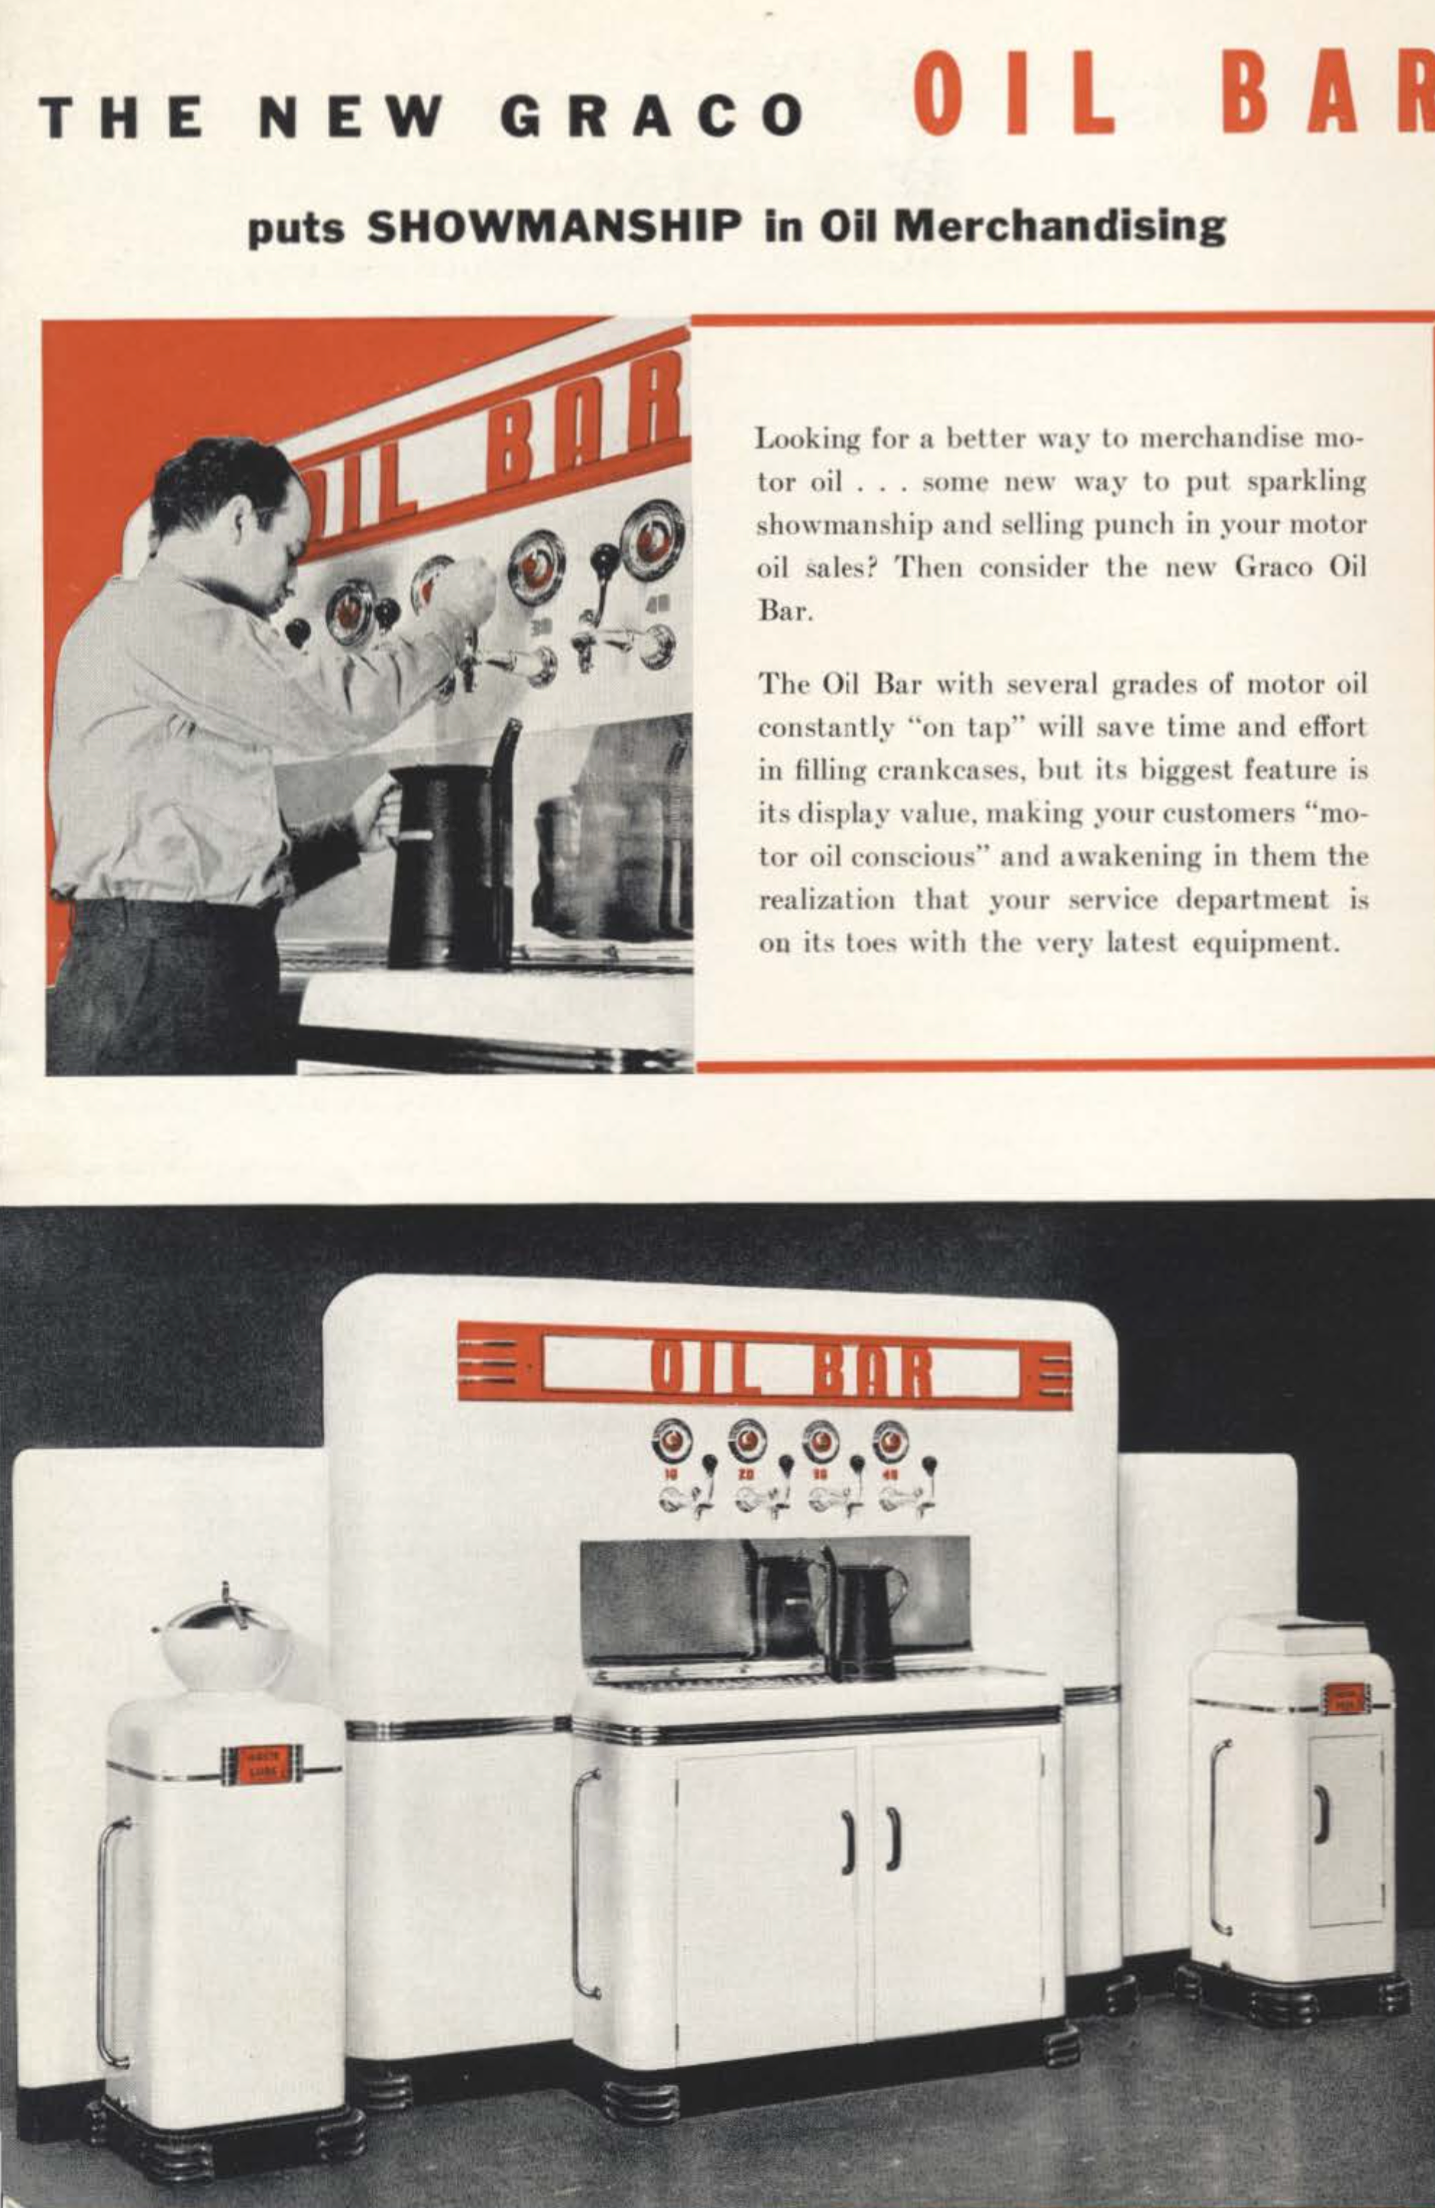 Graco Oil Bar from 1941 Catalog